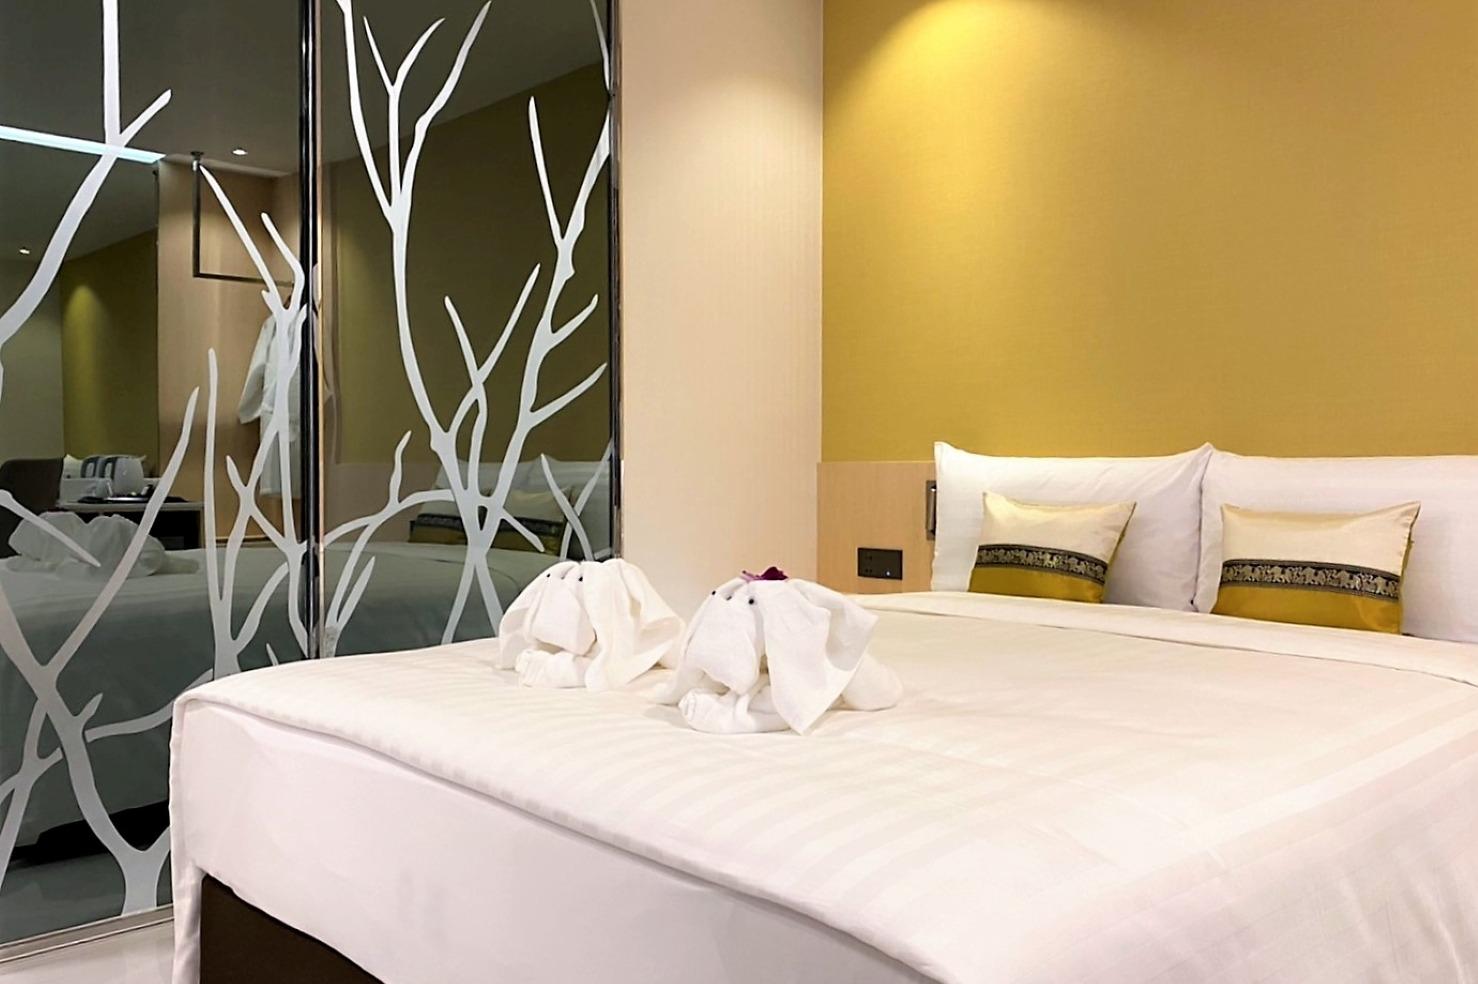 Evergreen Laurel Hotel Sathorn - Image 1